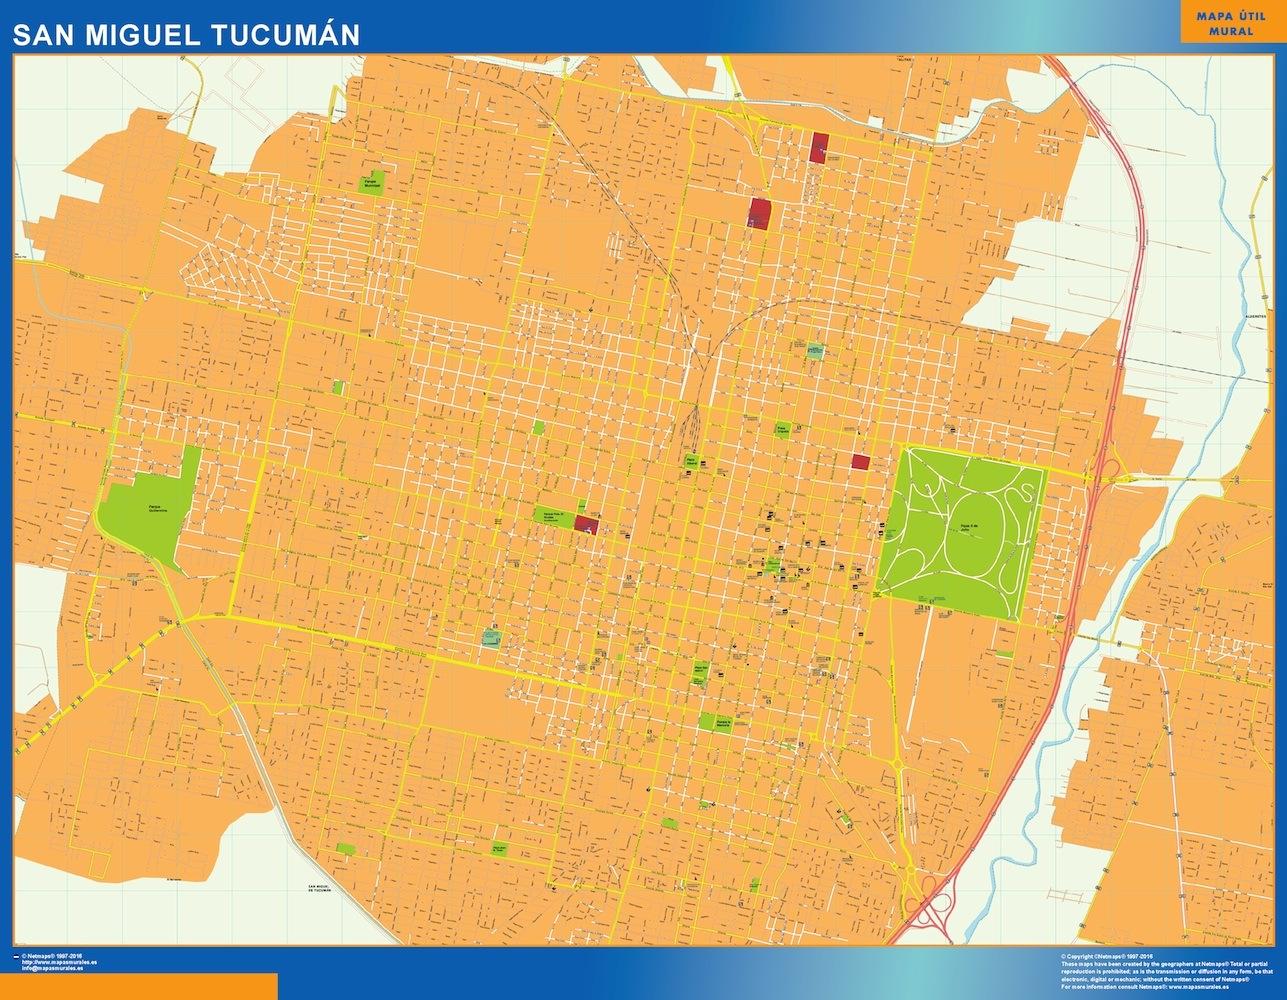 World Wall Maps Store Citymap San Miguel Tucuman Argentina Maps - Argentina map tucuman